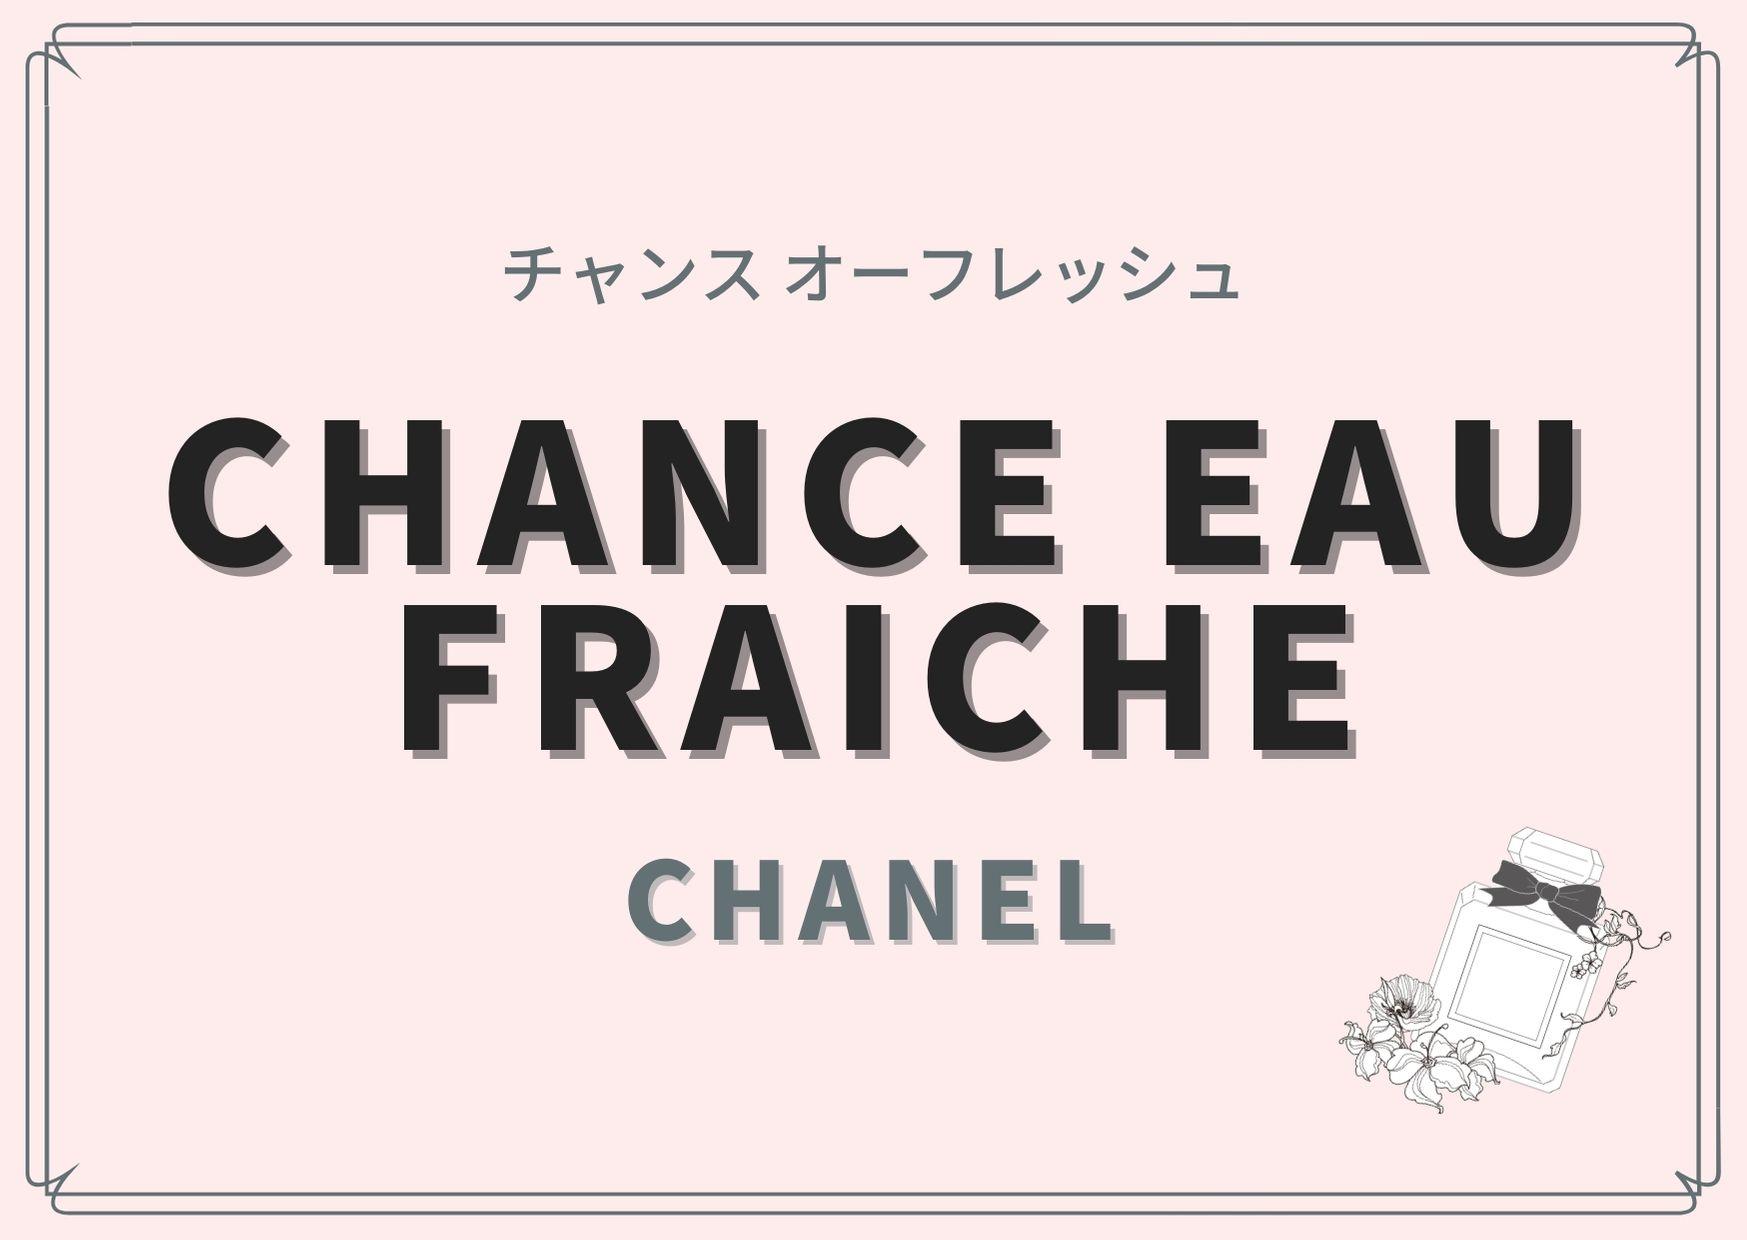 CHANCE EAU FRAICHE(チャンス オーフレッシュ)/CHANEL(シャネル)